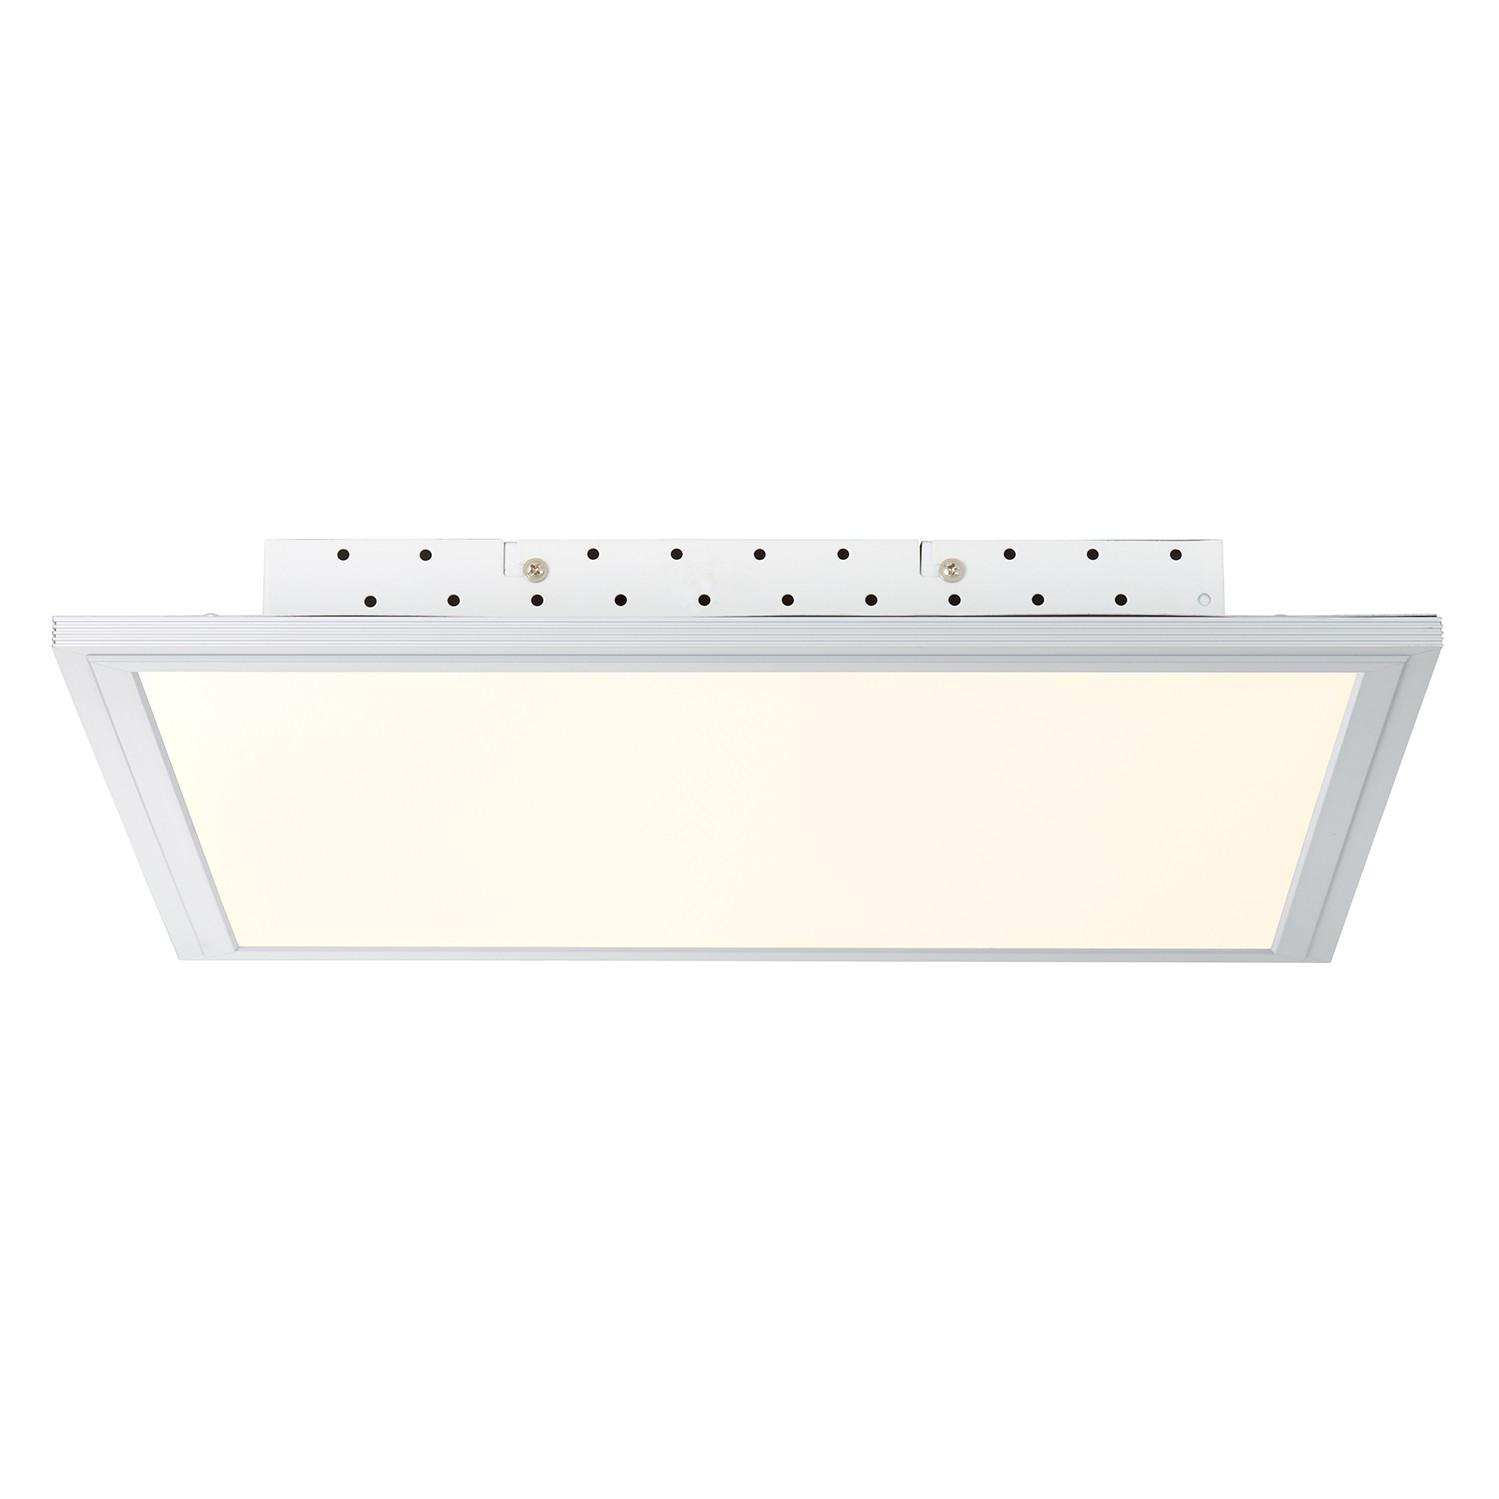 home24 LED-Deckenleuchte Flat I